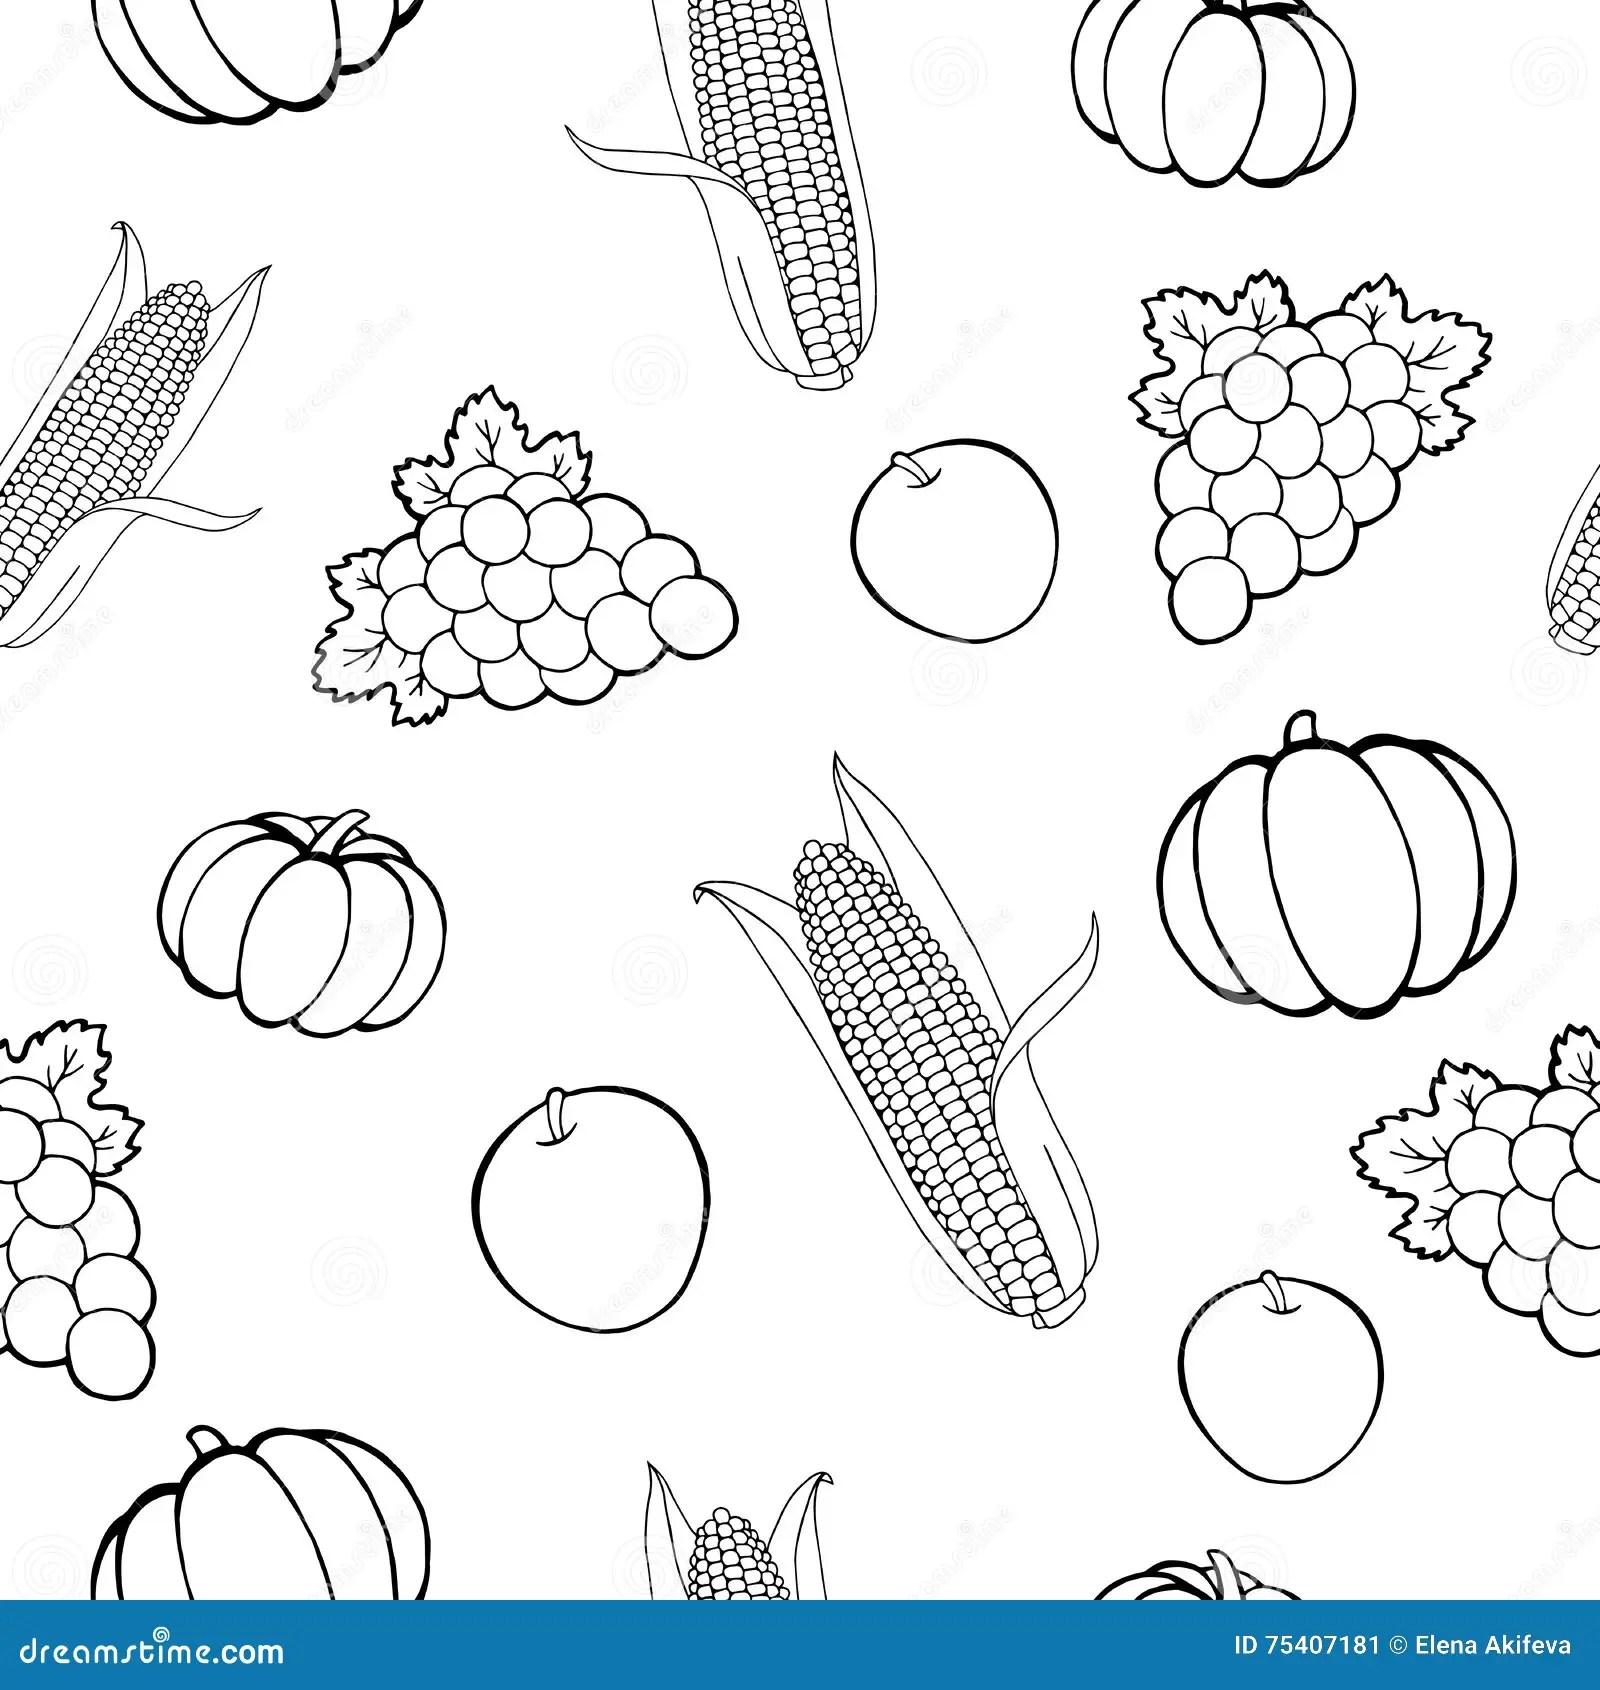 Harvest Pumpkin Apple G S Corn Graphic Art Seamless Pattern Black White Illustration Stock